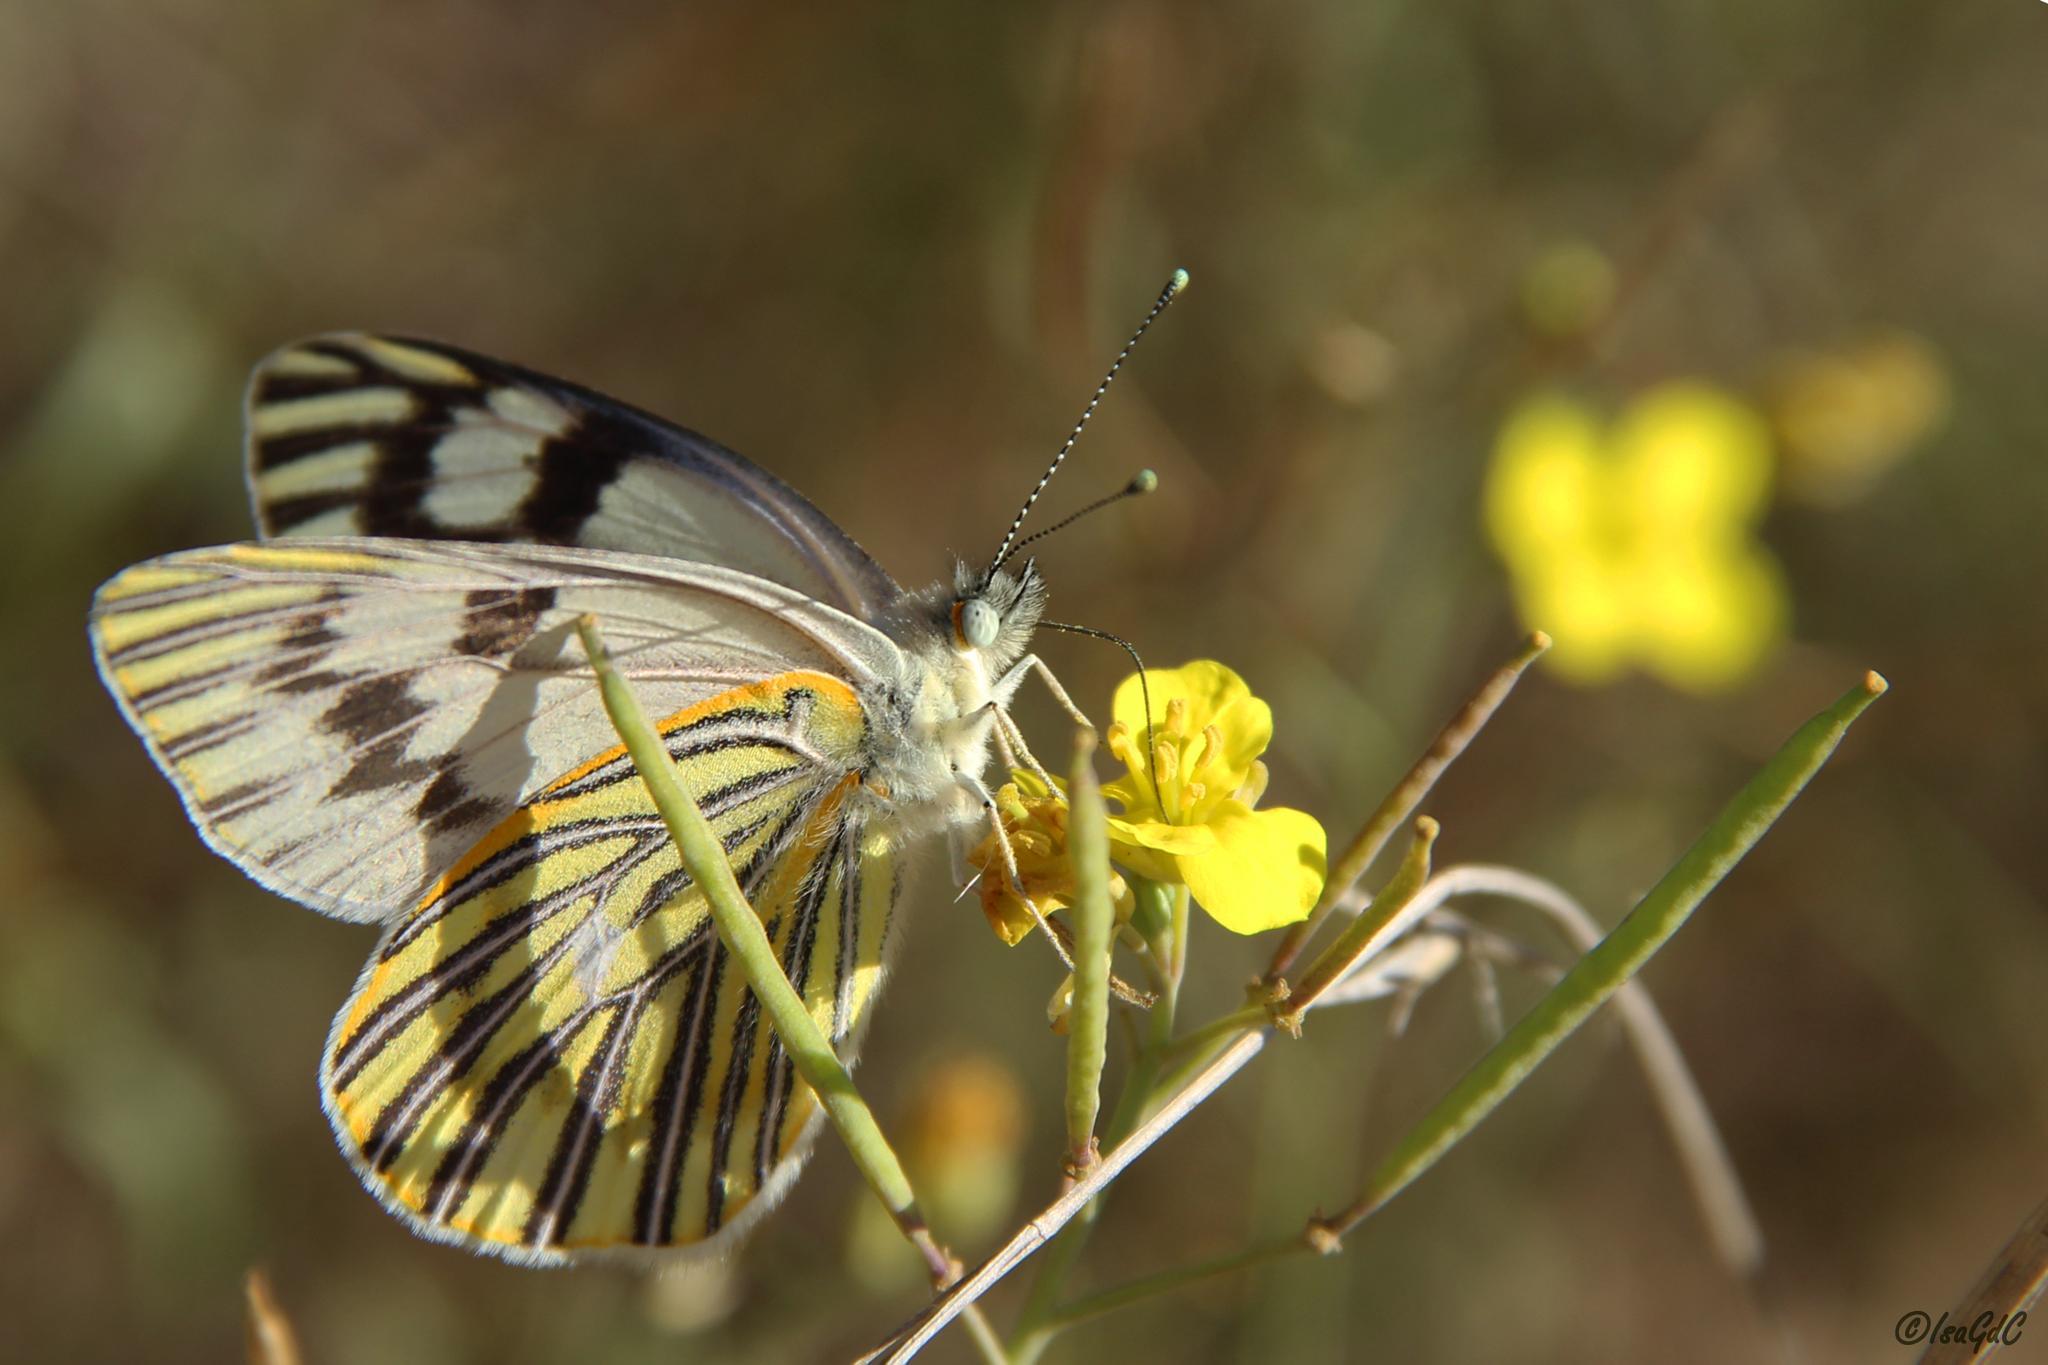 Nectar dorado by IsaGdC